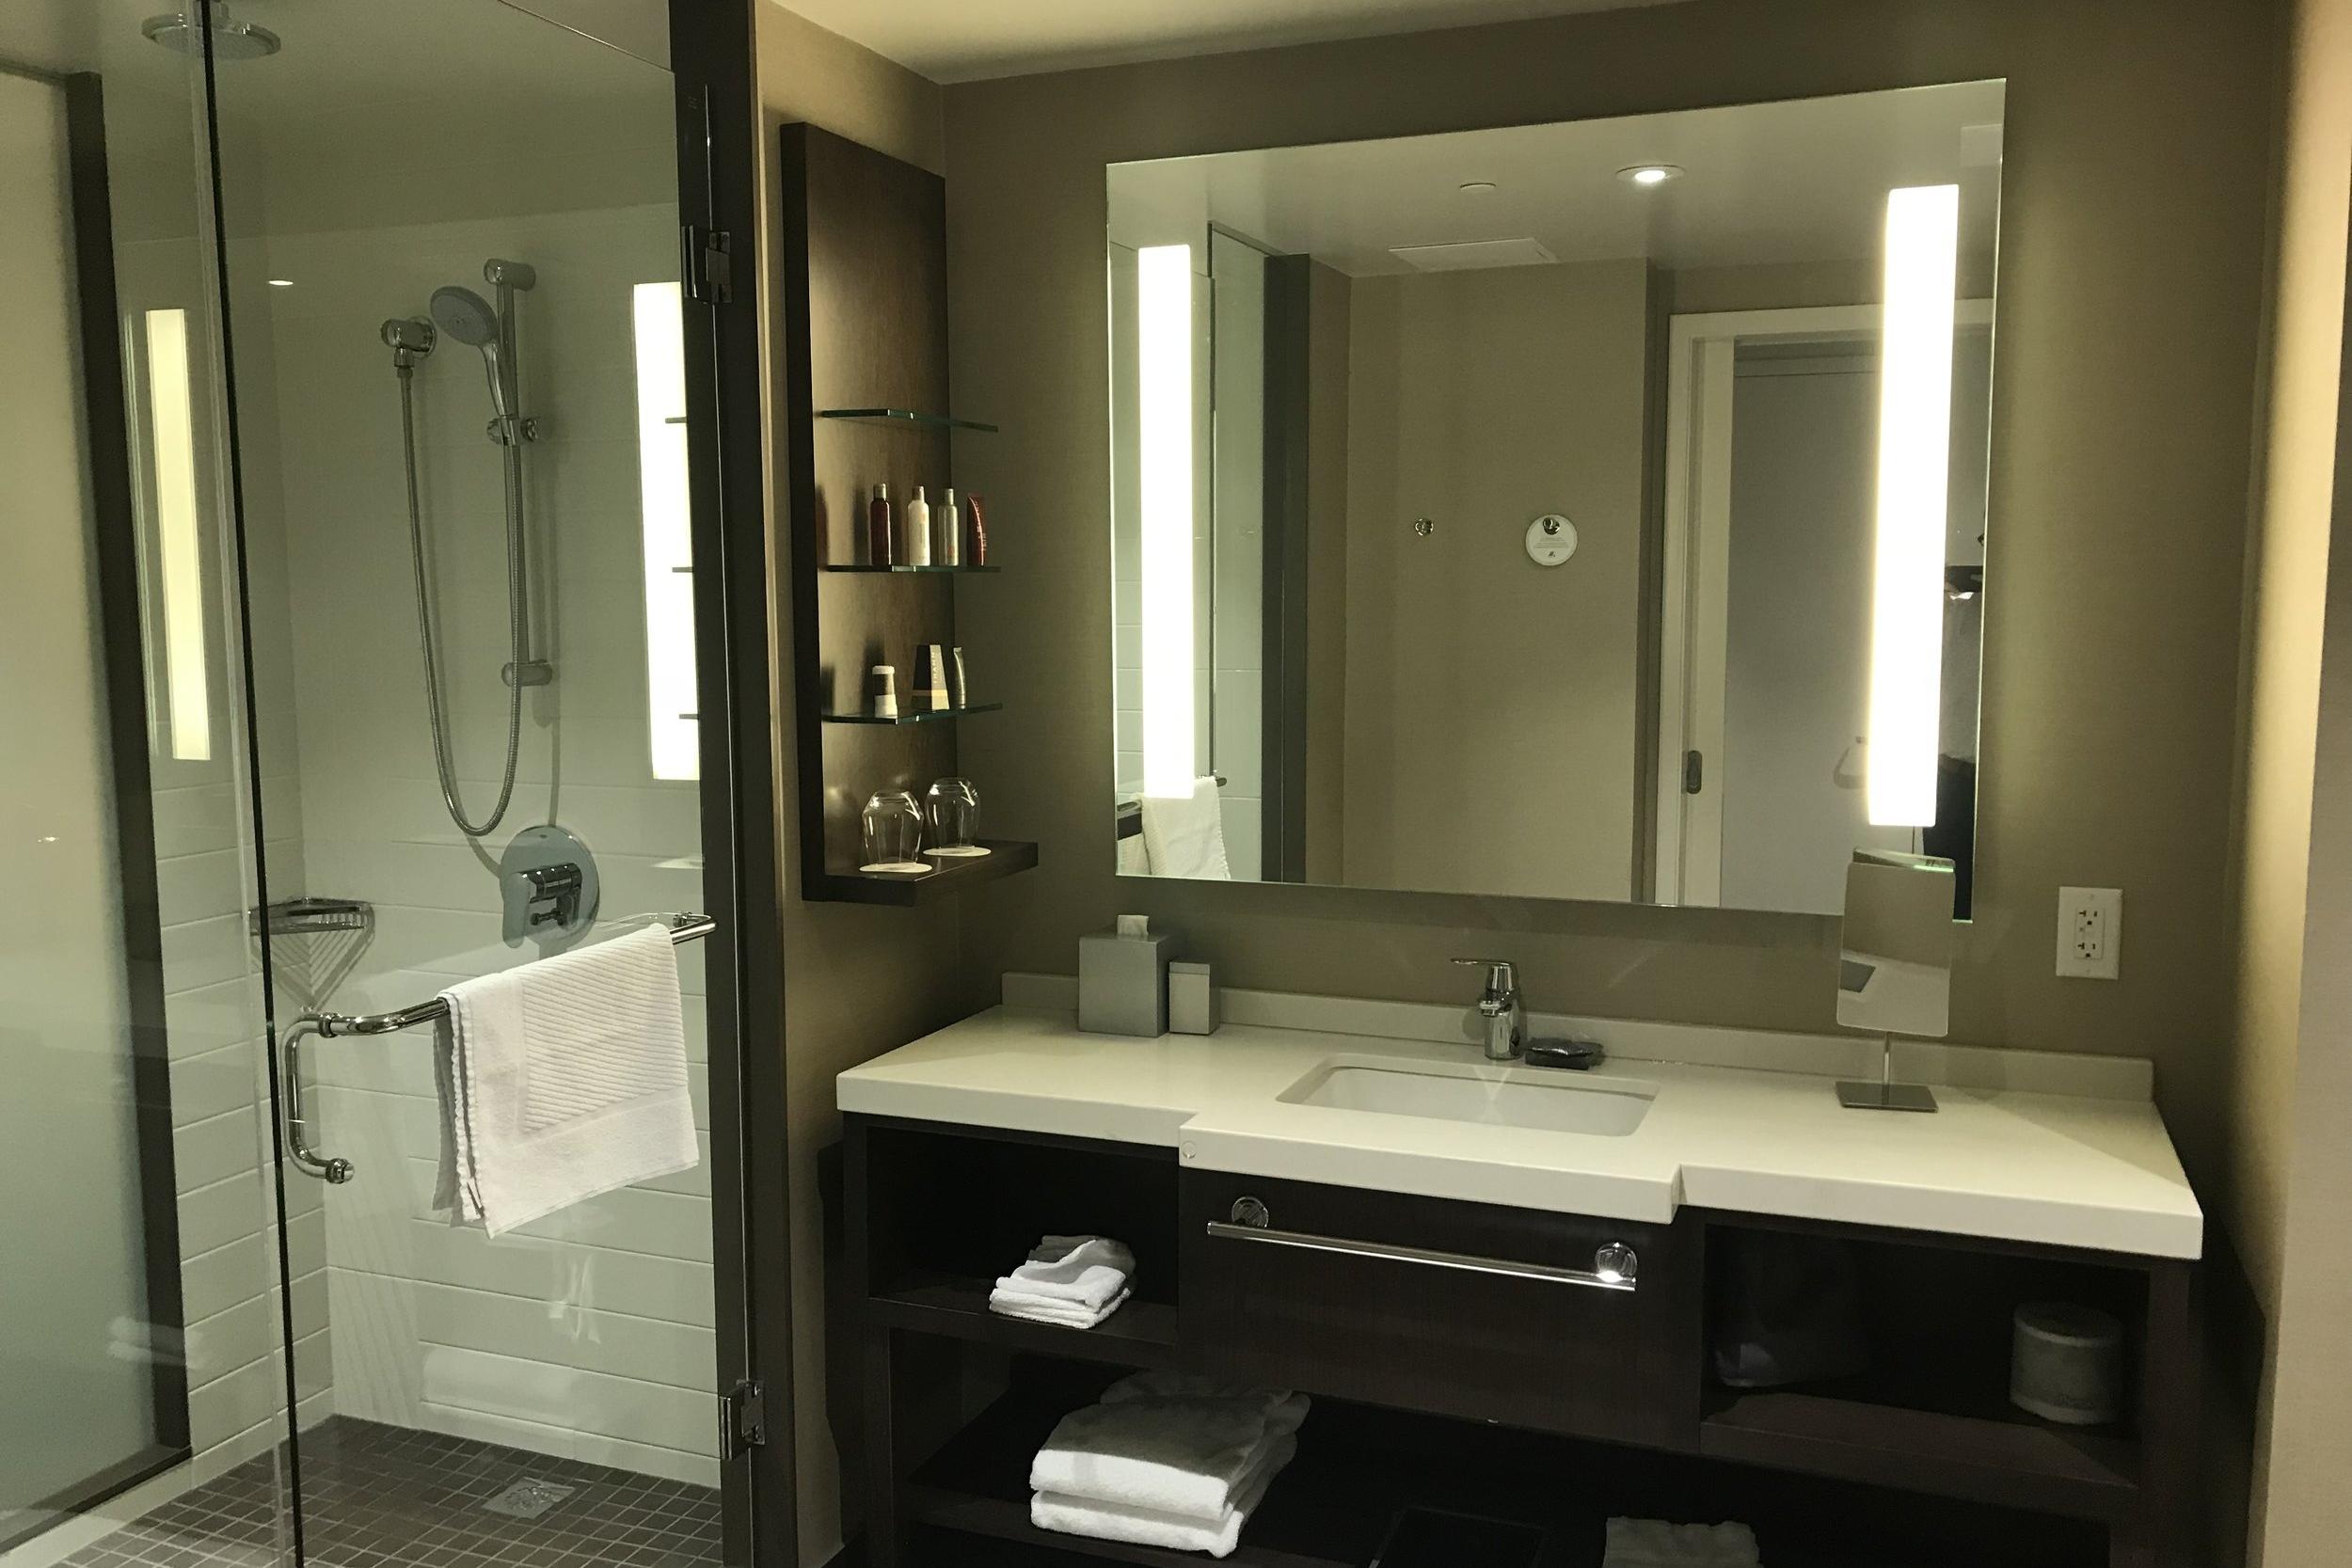 Marriott In-Terminal Hotel Calgary Airport – Bathroom